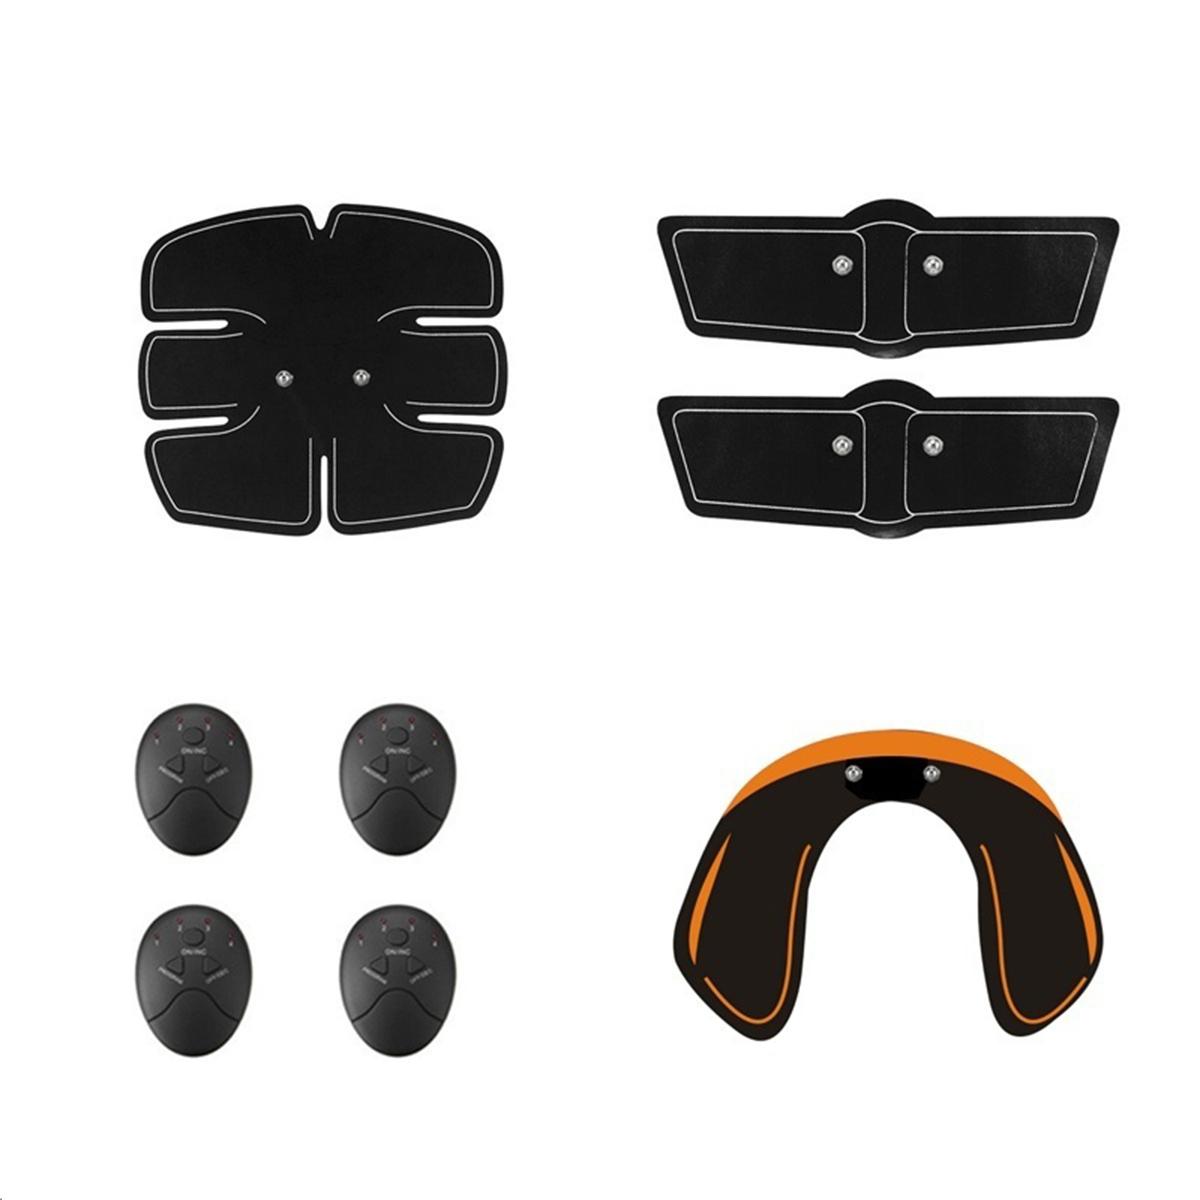 36d93f1b8 KALAOD 15Pcs Set Hip Trainer Abdominal Arm Muscle Training Body Shape Sports  Smart Fitness ABS